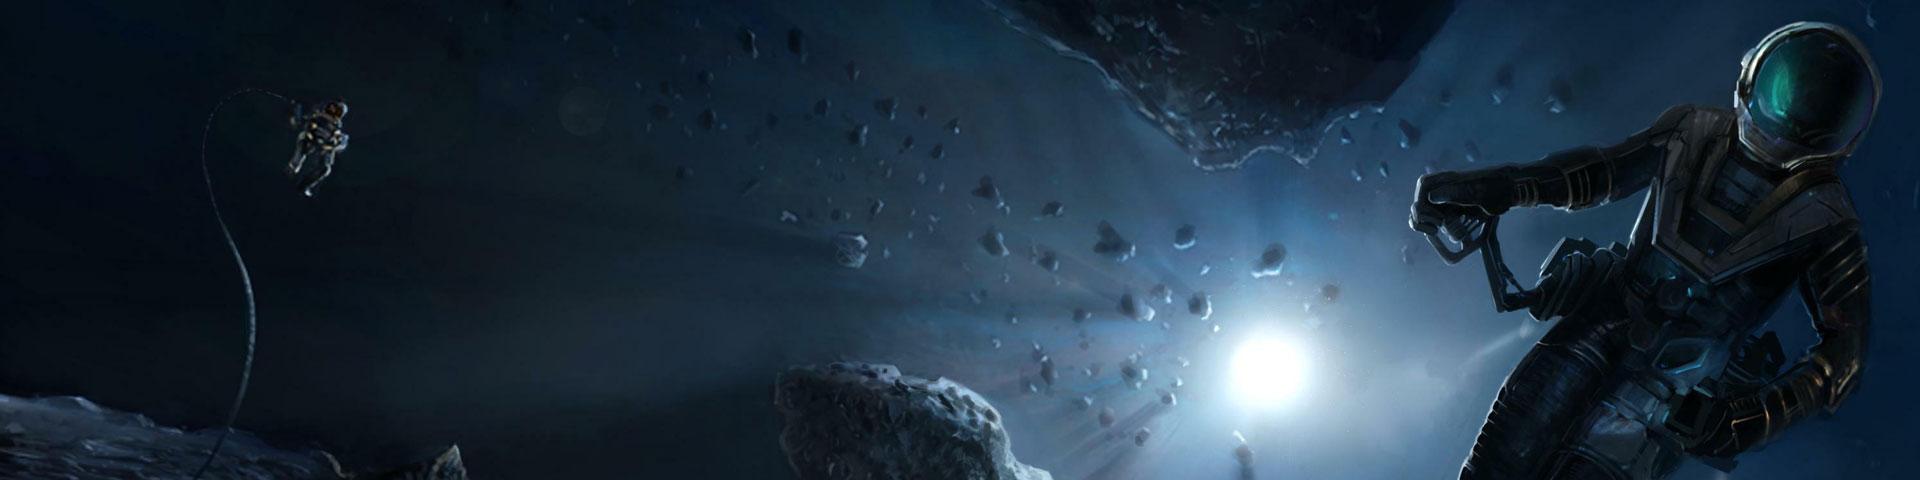 An slim-suited astronaut flies through an asteroid field. A blue-white sun shines in deep space.